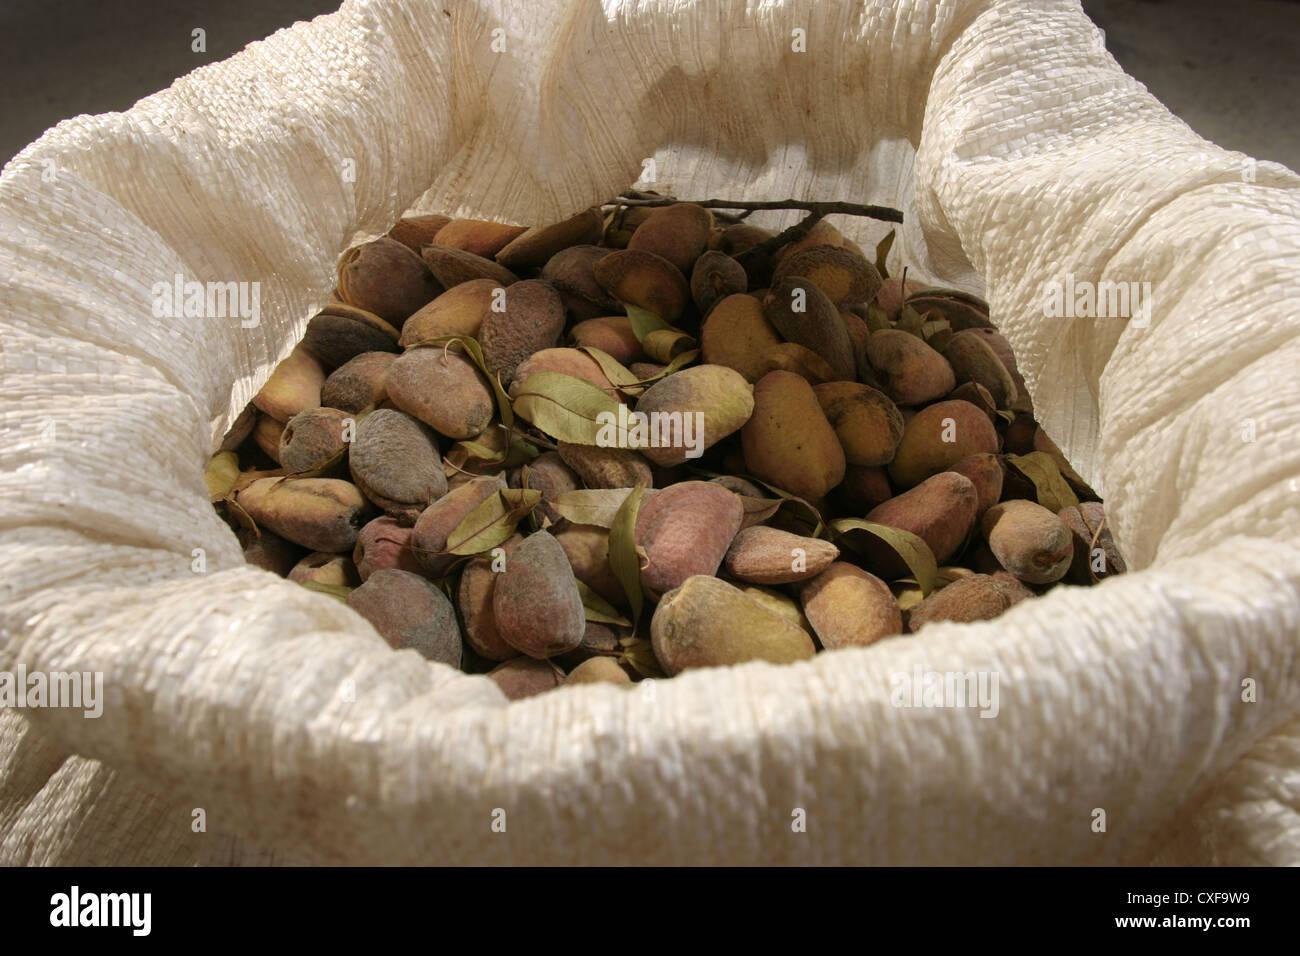 Picture: Steve Race - Freshly harvested Llargueta almonds in sacks, Catalunya, Spain. - Stock Image